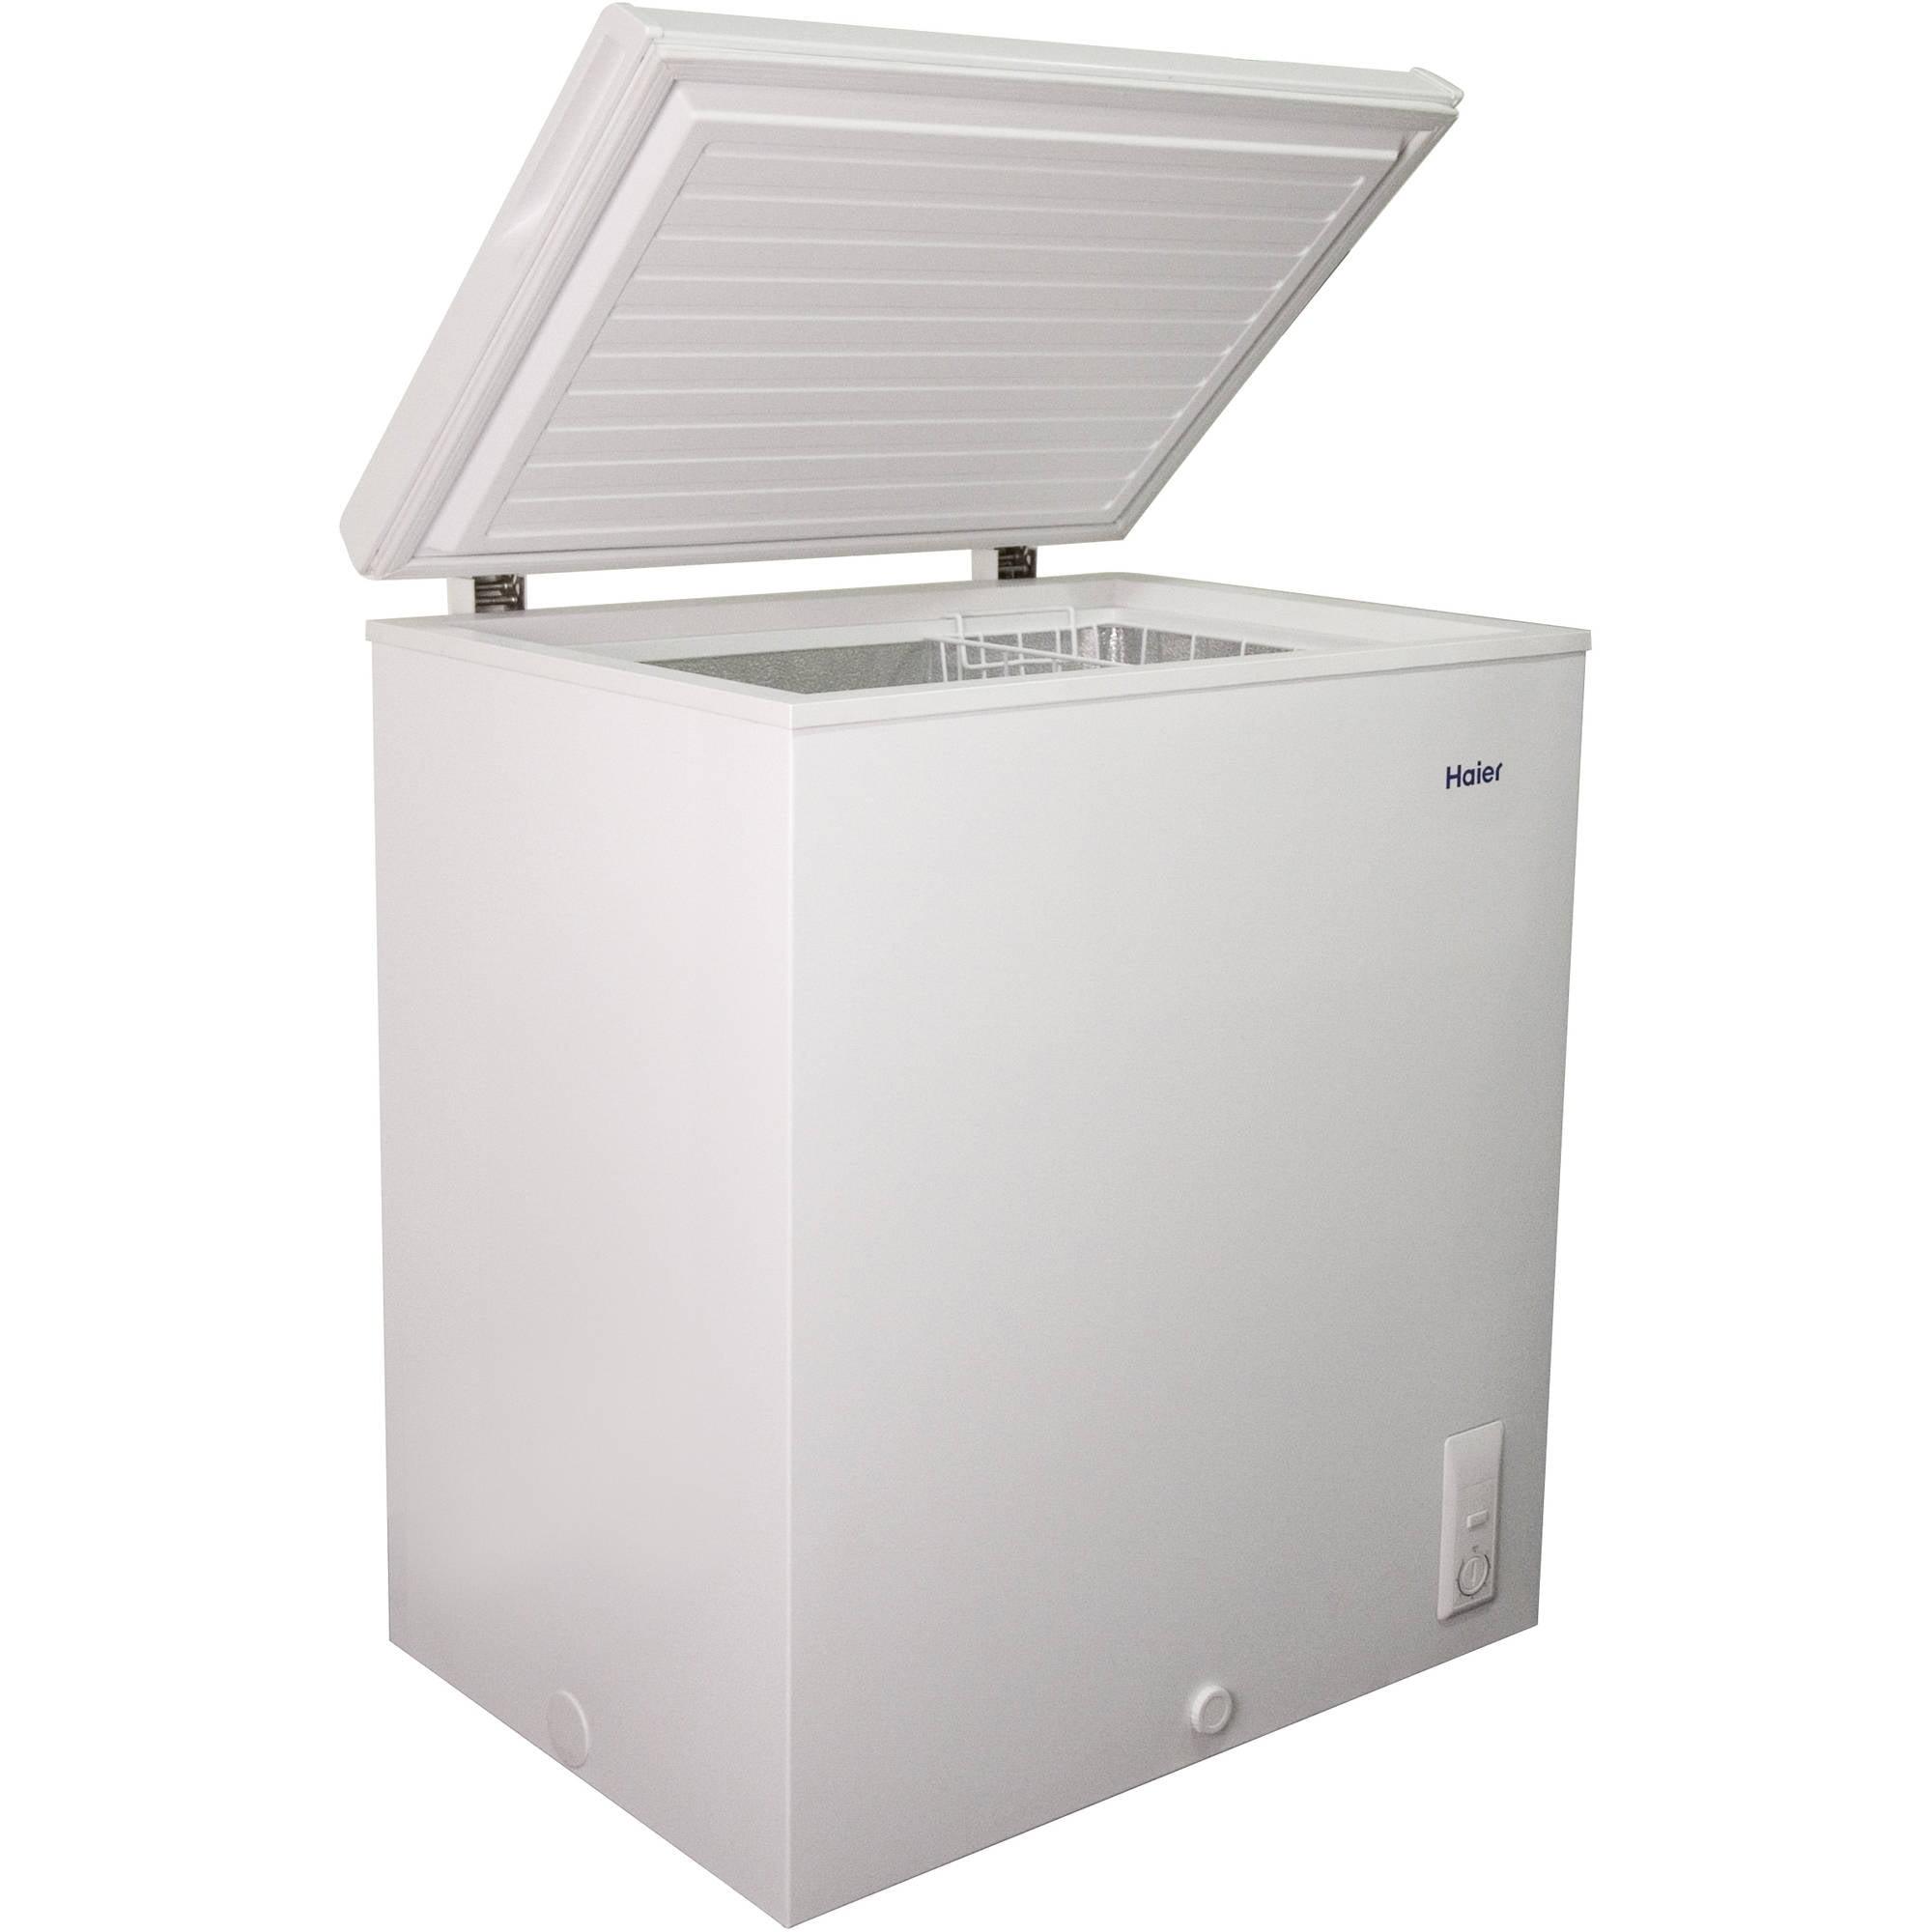 Haier 5.0 cu.ft. Capacity Chest Freezer, HF50CM23NW ... on